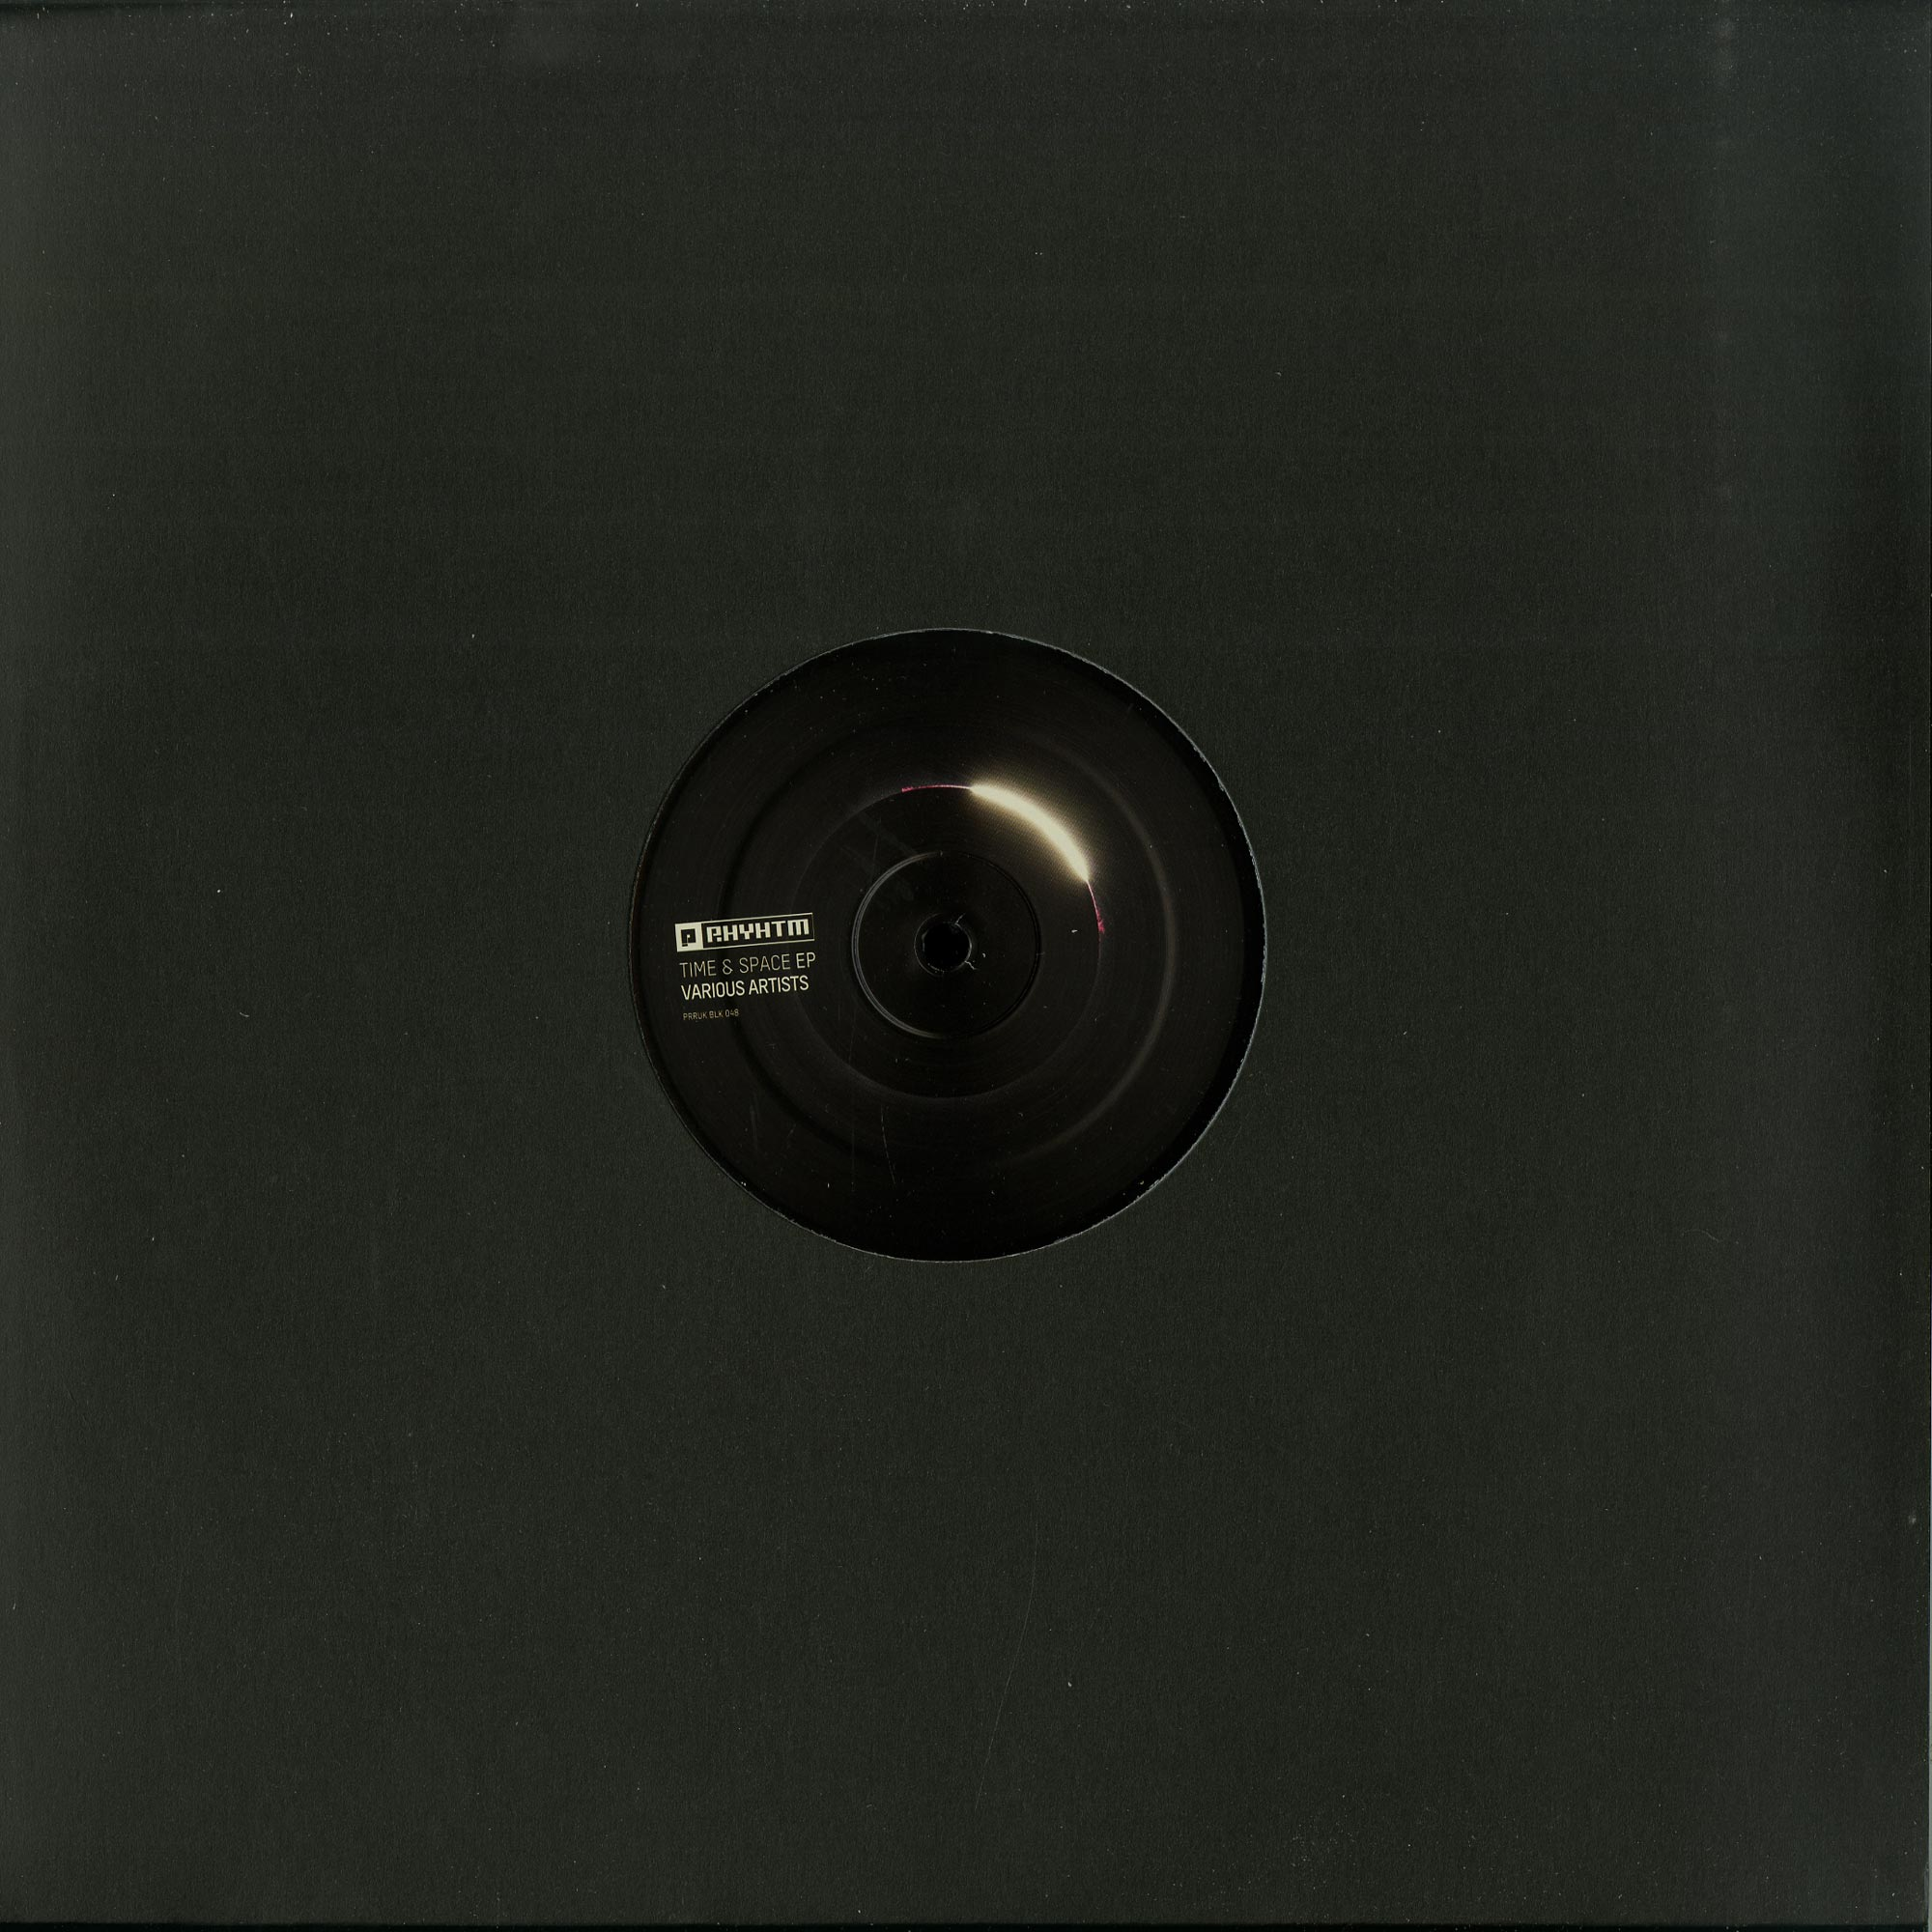 Vinicius Honorio / Berg Jaar / Rorsch / Linn Elisabet - TIME SPACE EP